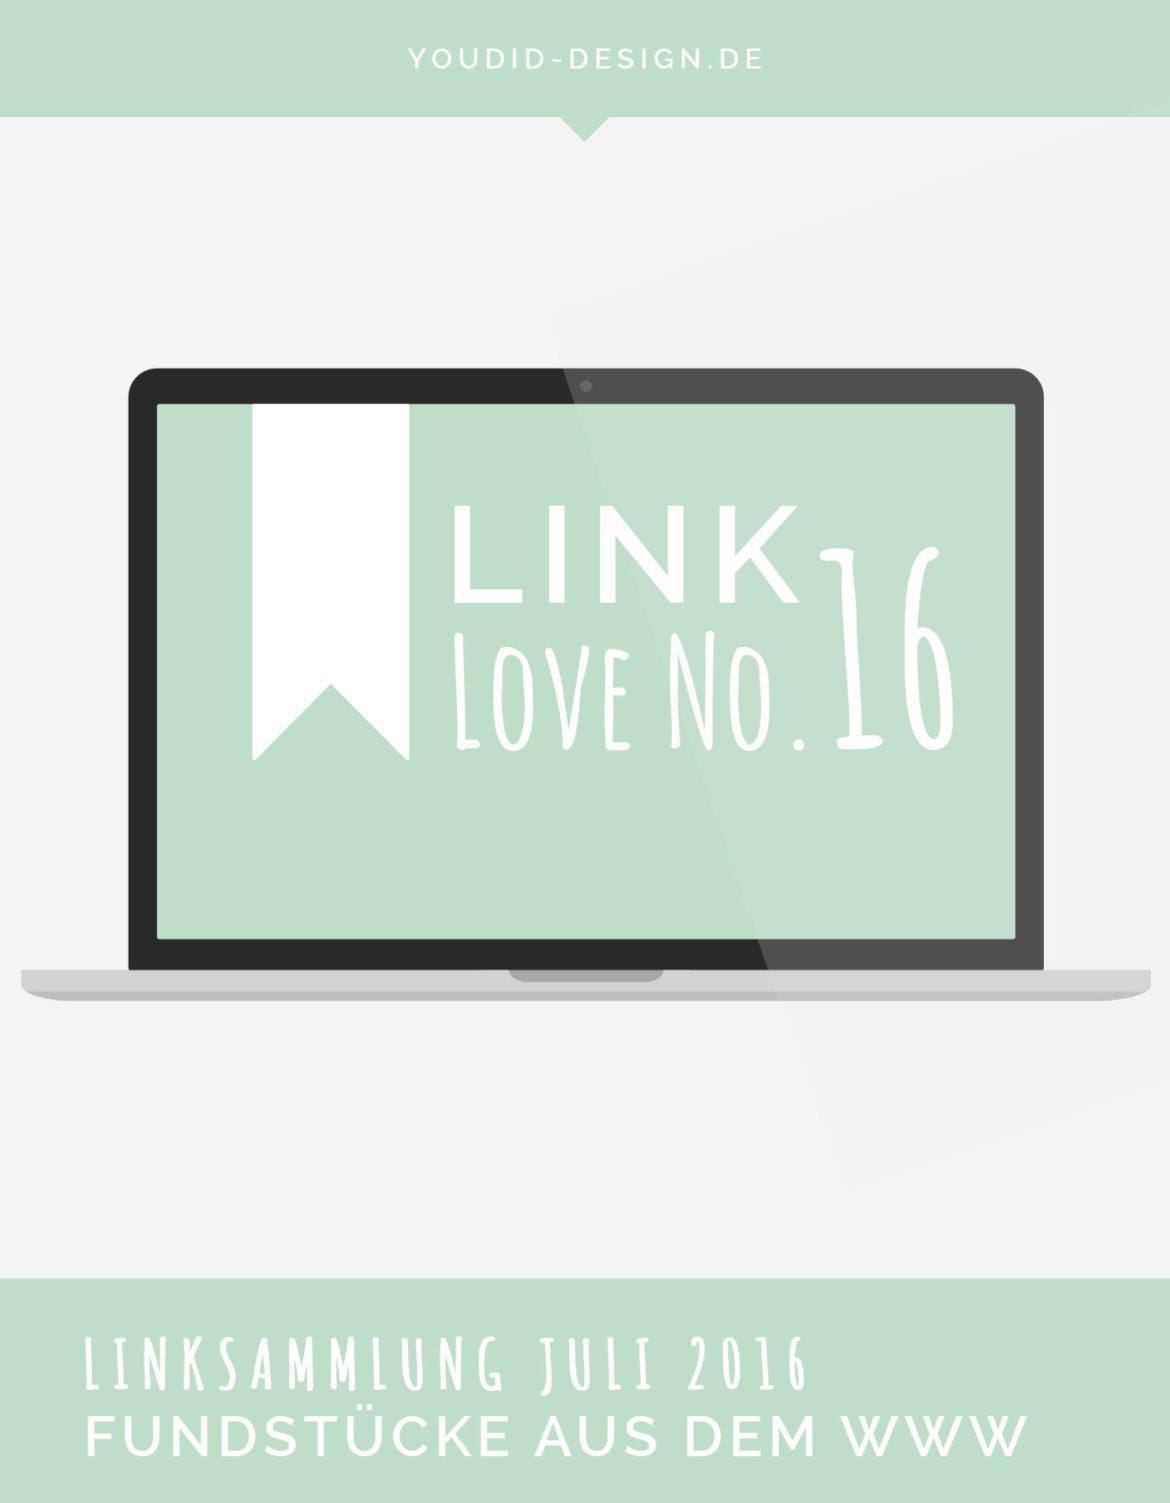 Linksammlung Linklove No 16 Juli 2016   www.youdid-design.de